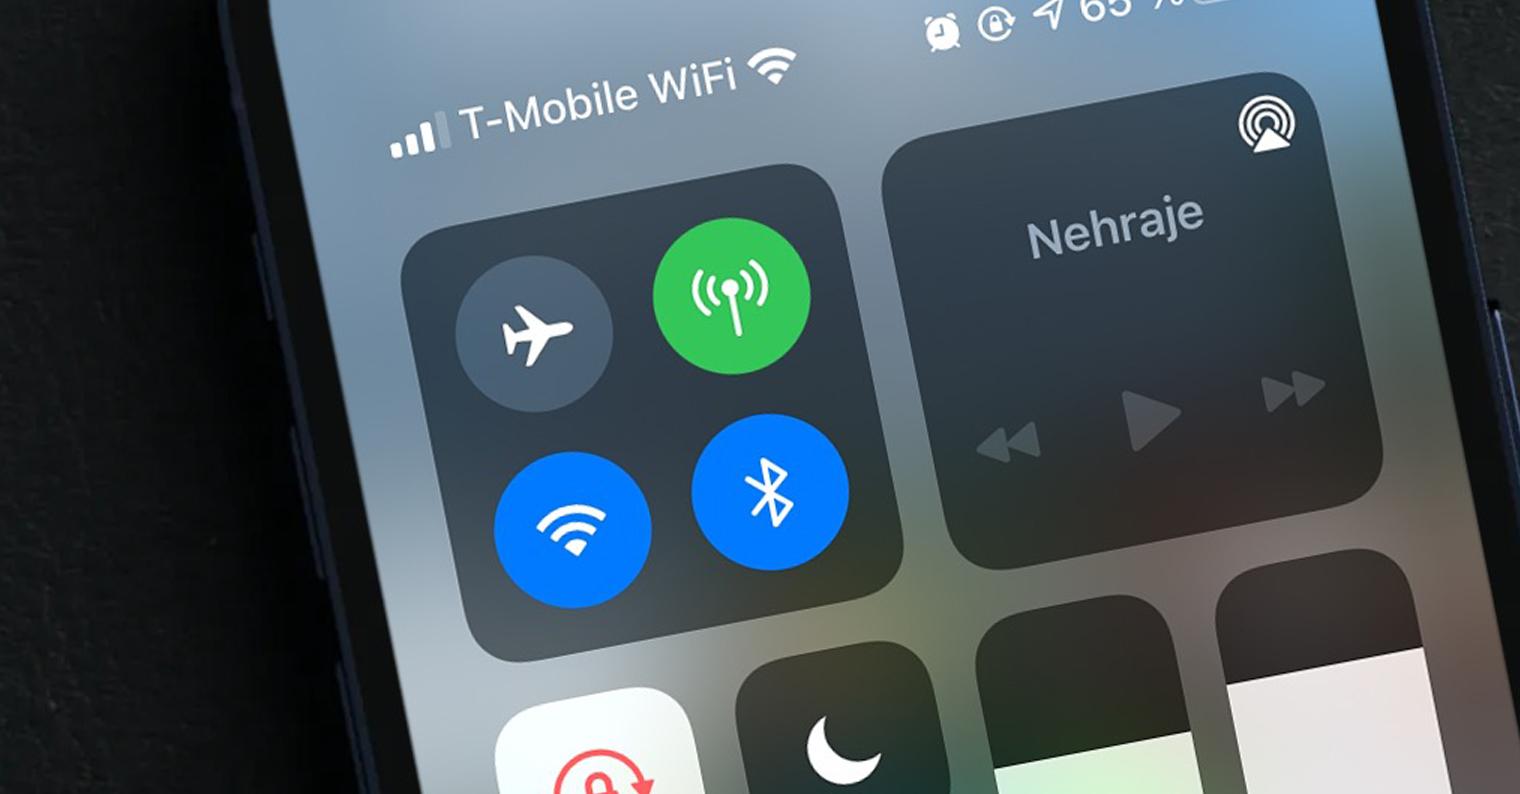 wifi mobilní data iphone